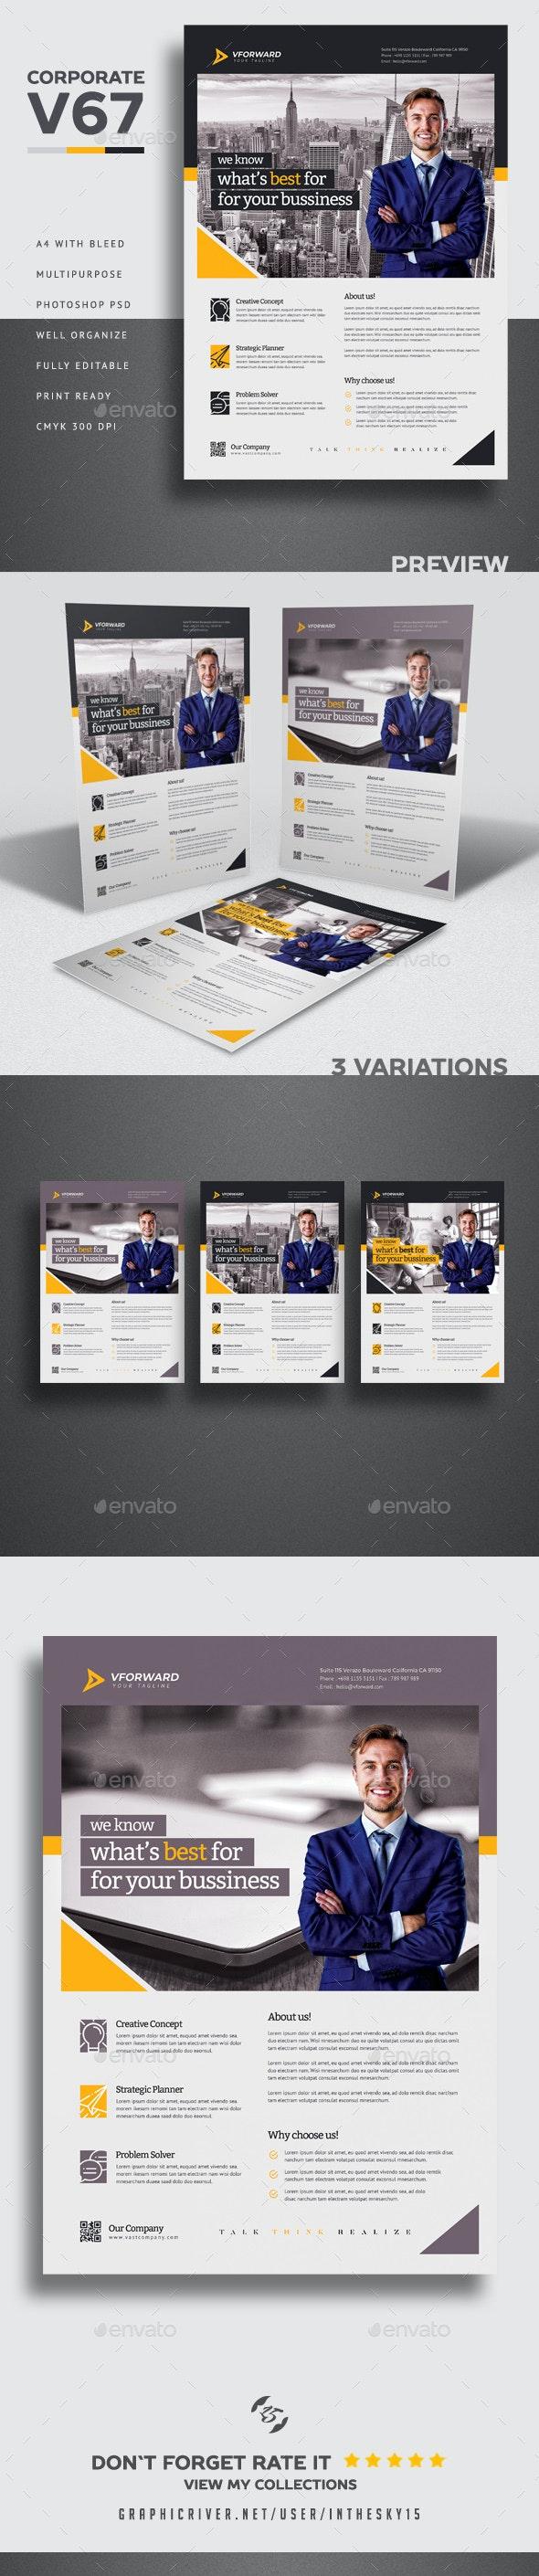 Corporate V67 Flyer - Corporate Brochures